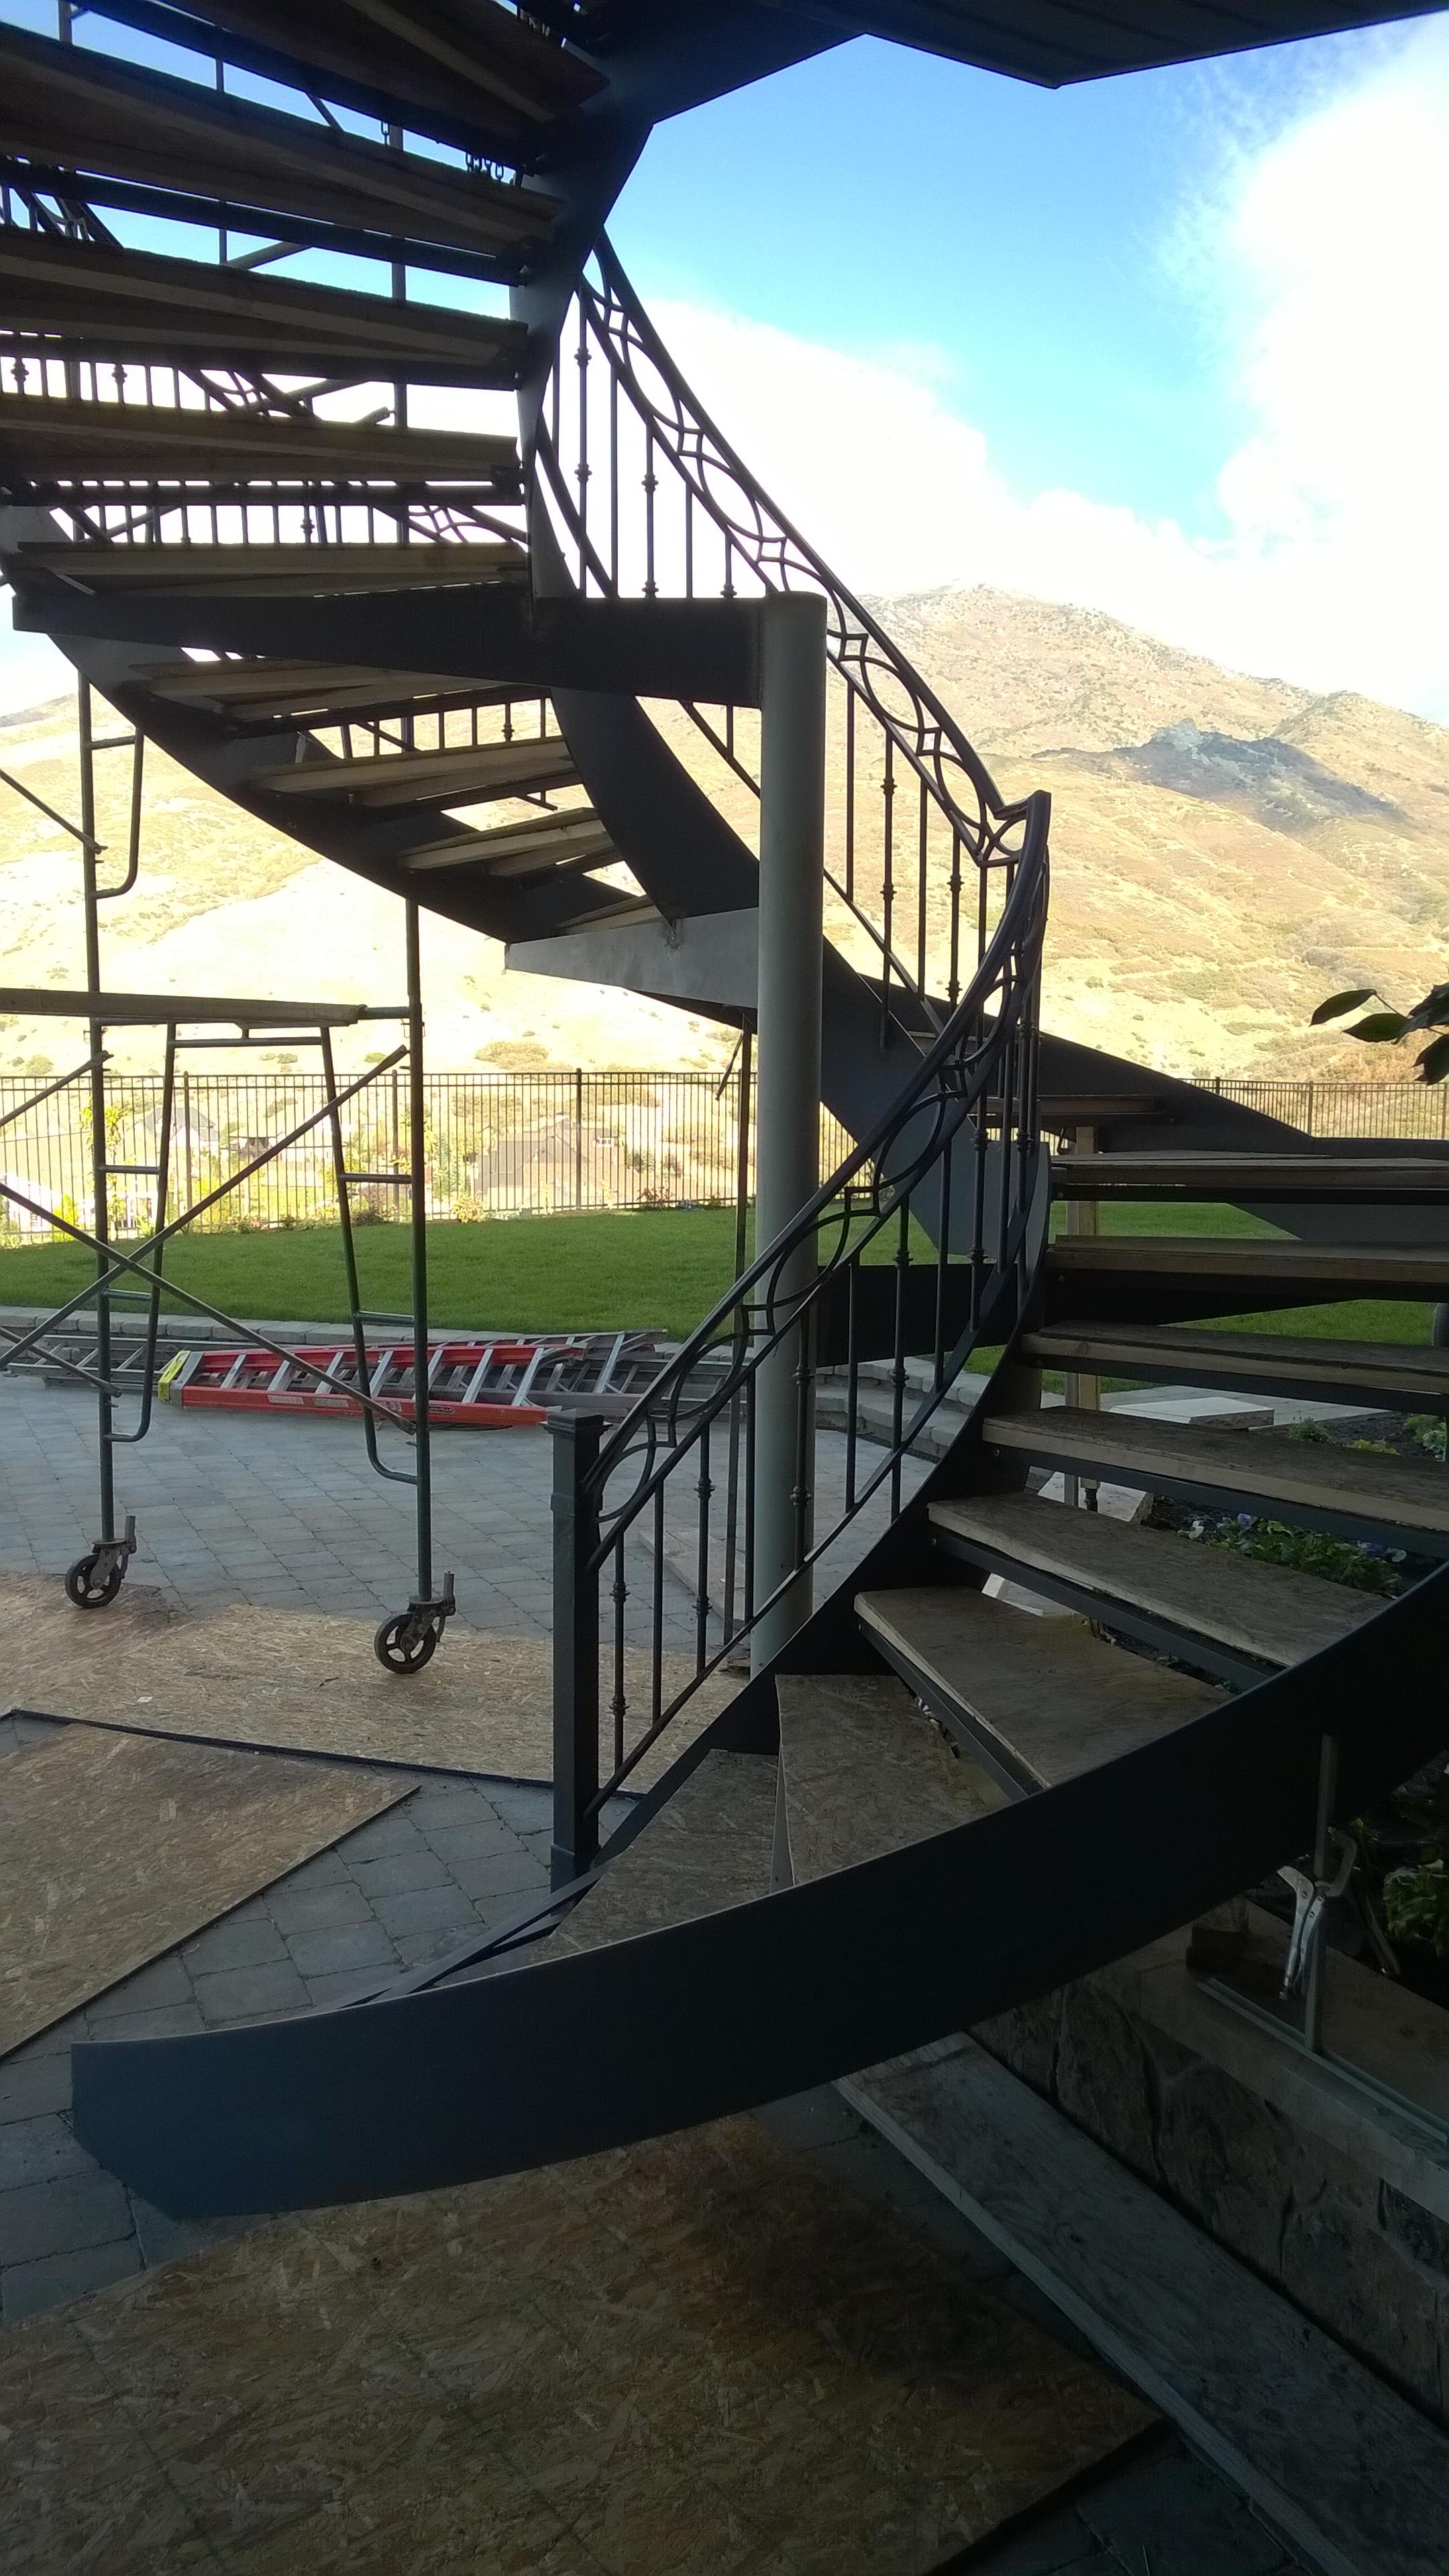 41-0061-iron-anvil-stairs-grand-circular-tread-concrete-18189-COSGRAVE    (2)